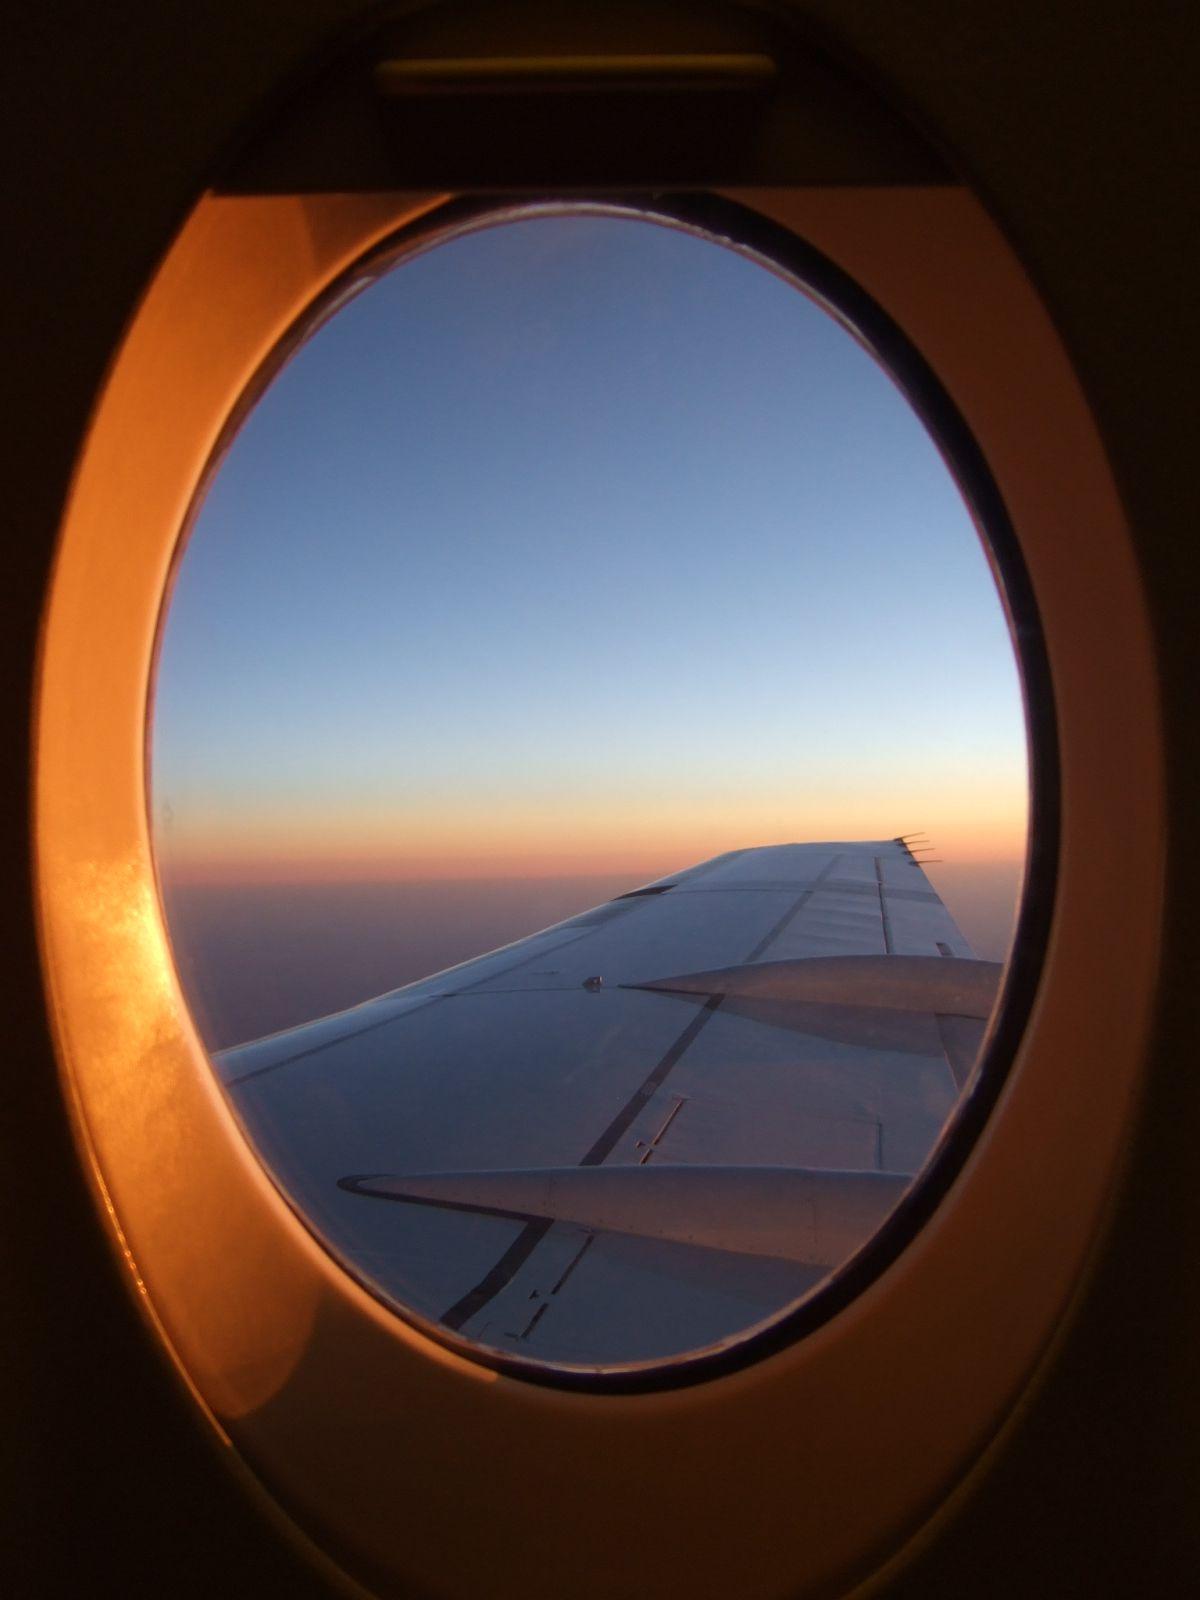 vue de l 39 avion avion hublot orange bleu ciel soleil